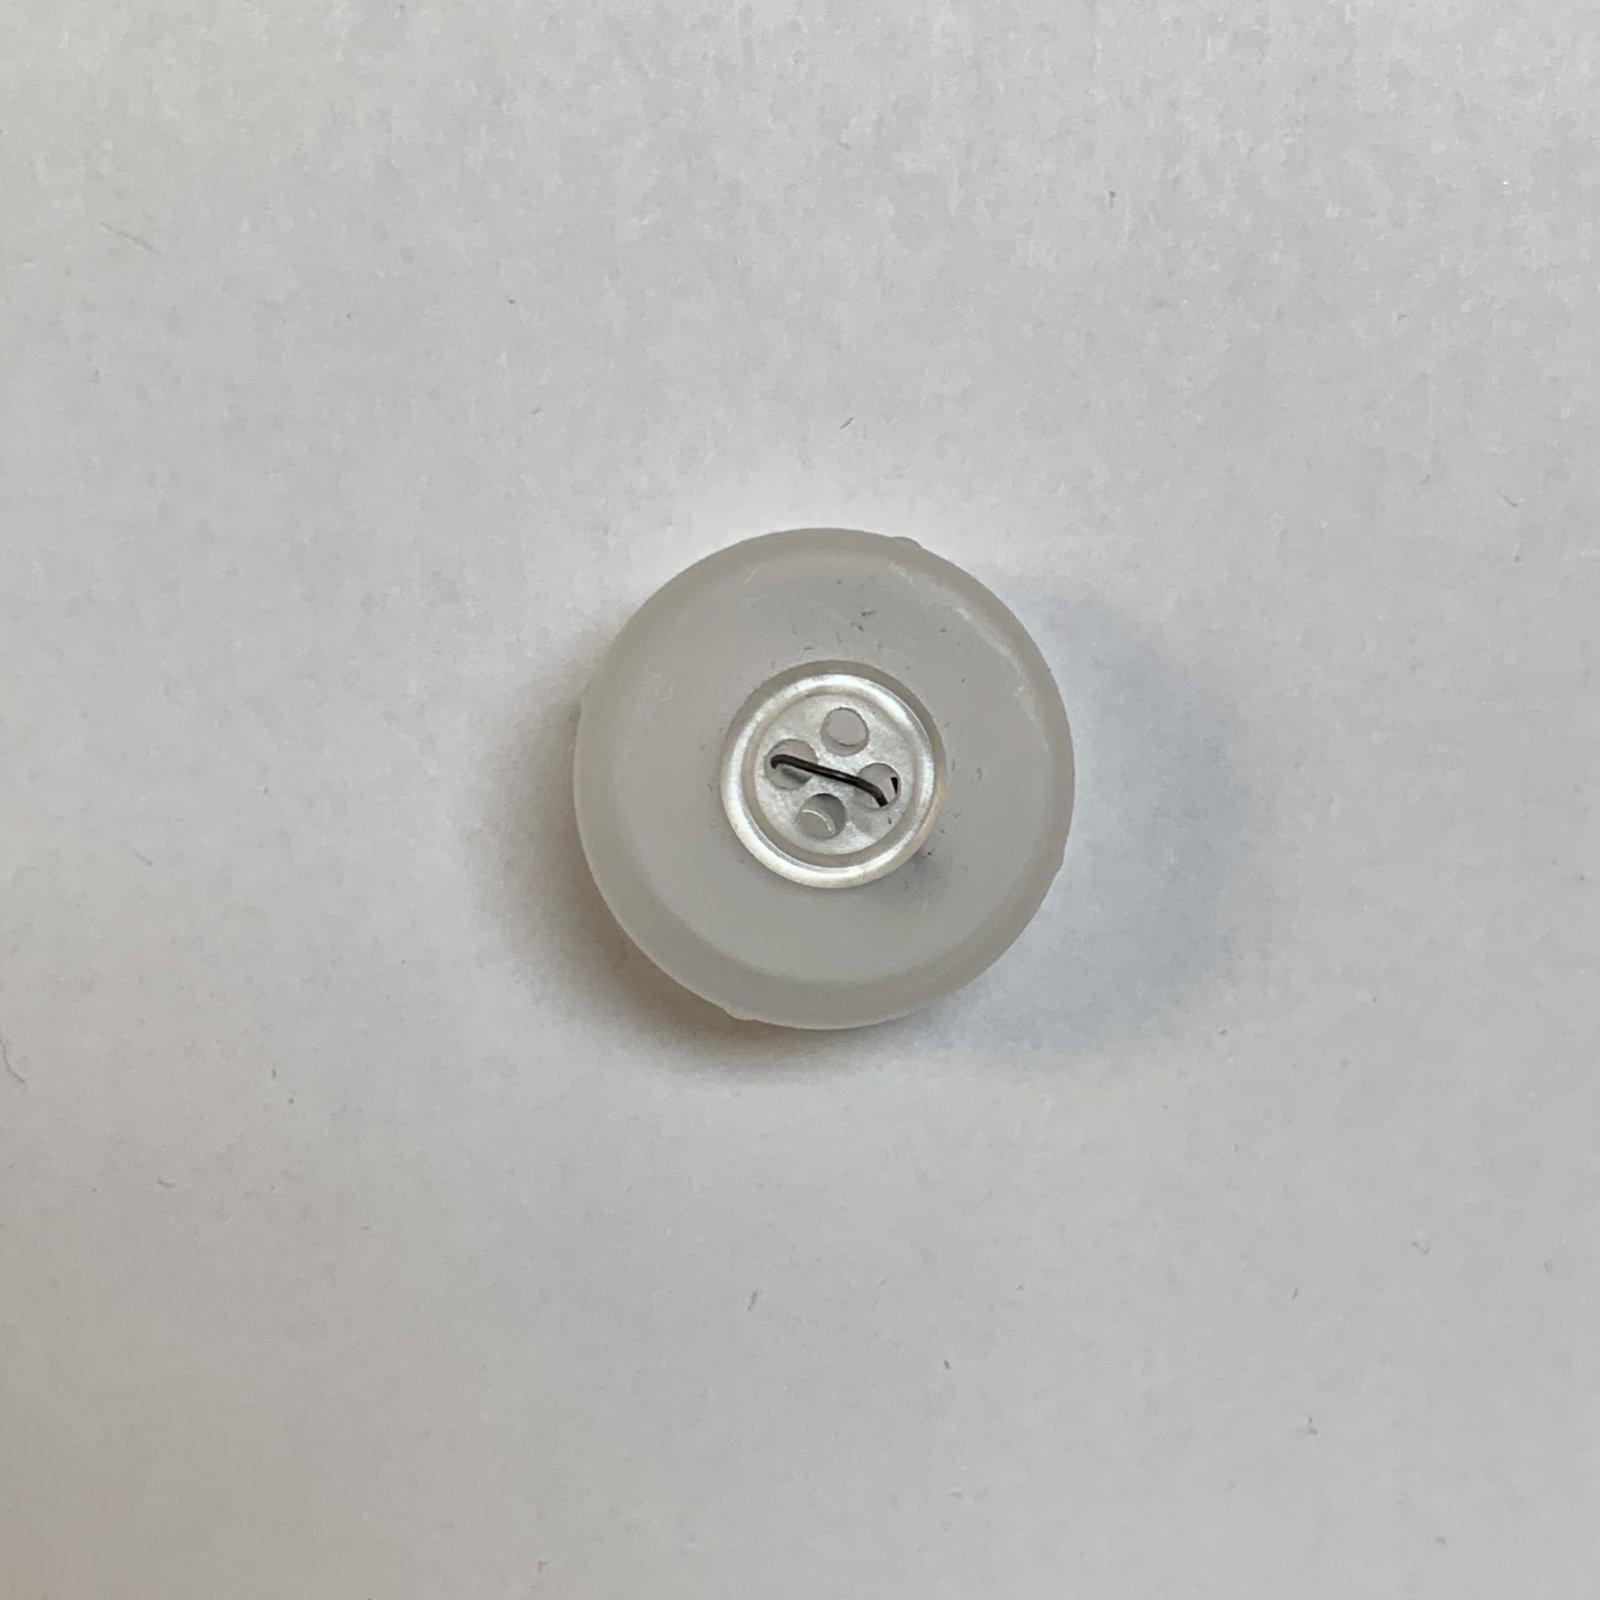 White Shiny Finish Button 1/3 Inch